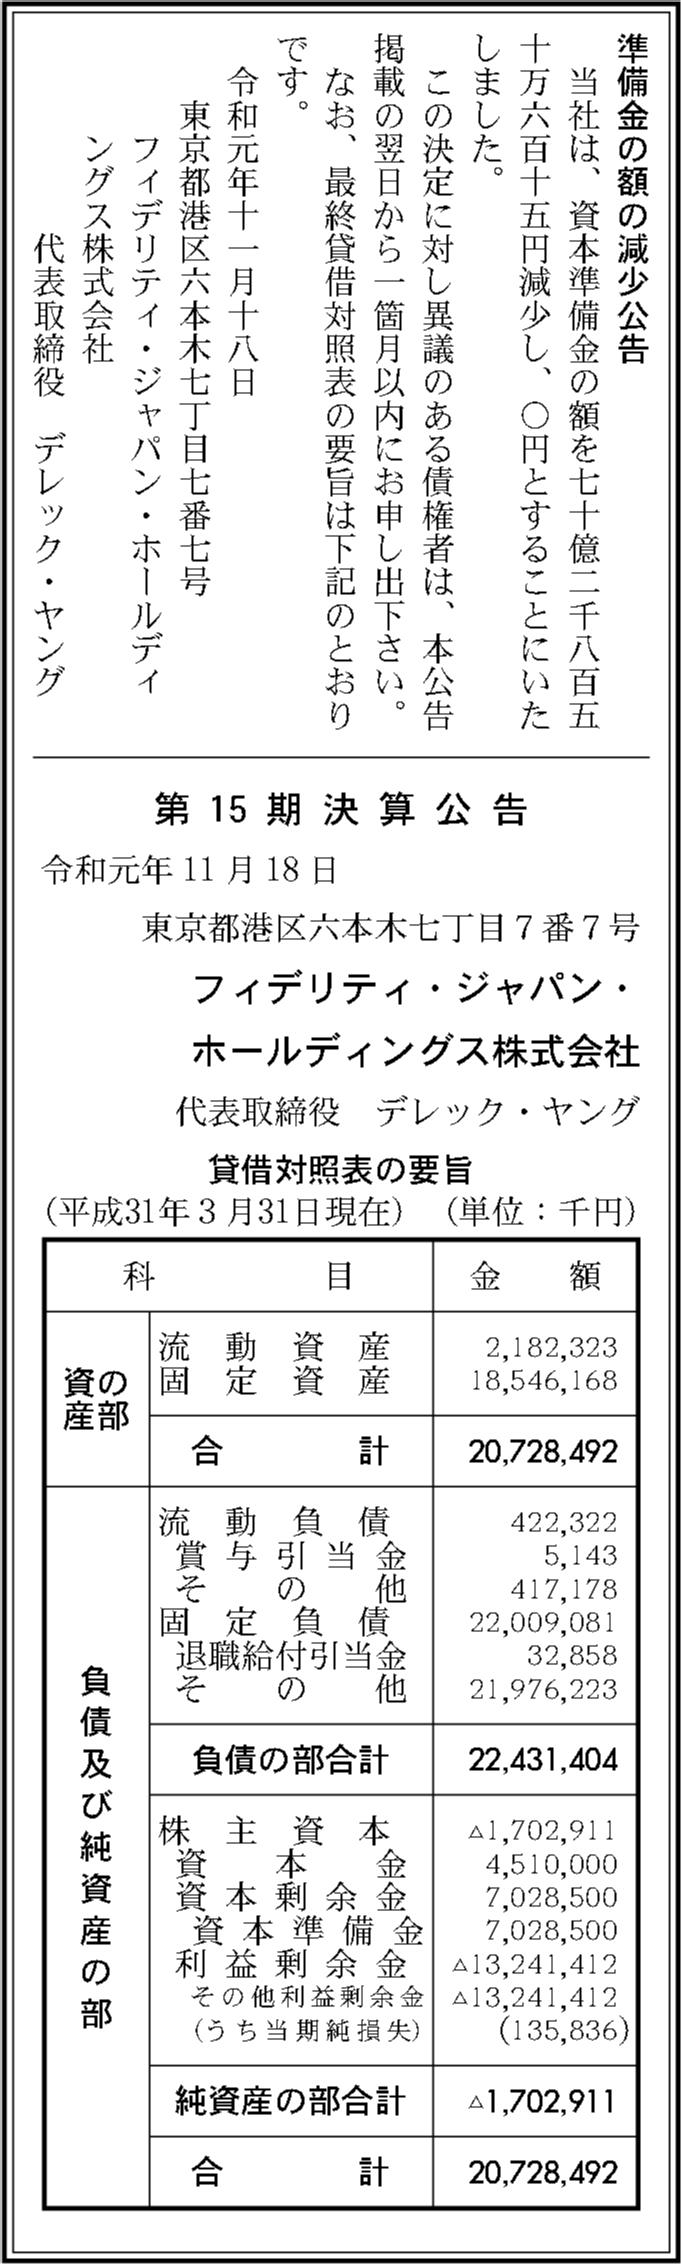 0096 d32a46ab8e03c07663dec0c3b796dbb33c0794efe1c0c884e329e1d2a9fb012a510b23a8e99de2cc227290d0f9c950a0a51987b2839fcfbaea3c967f2f436c21 03